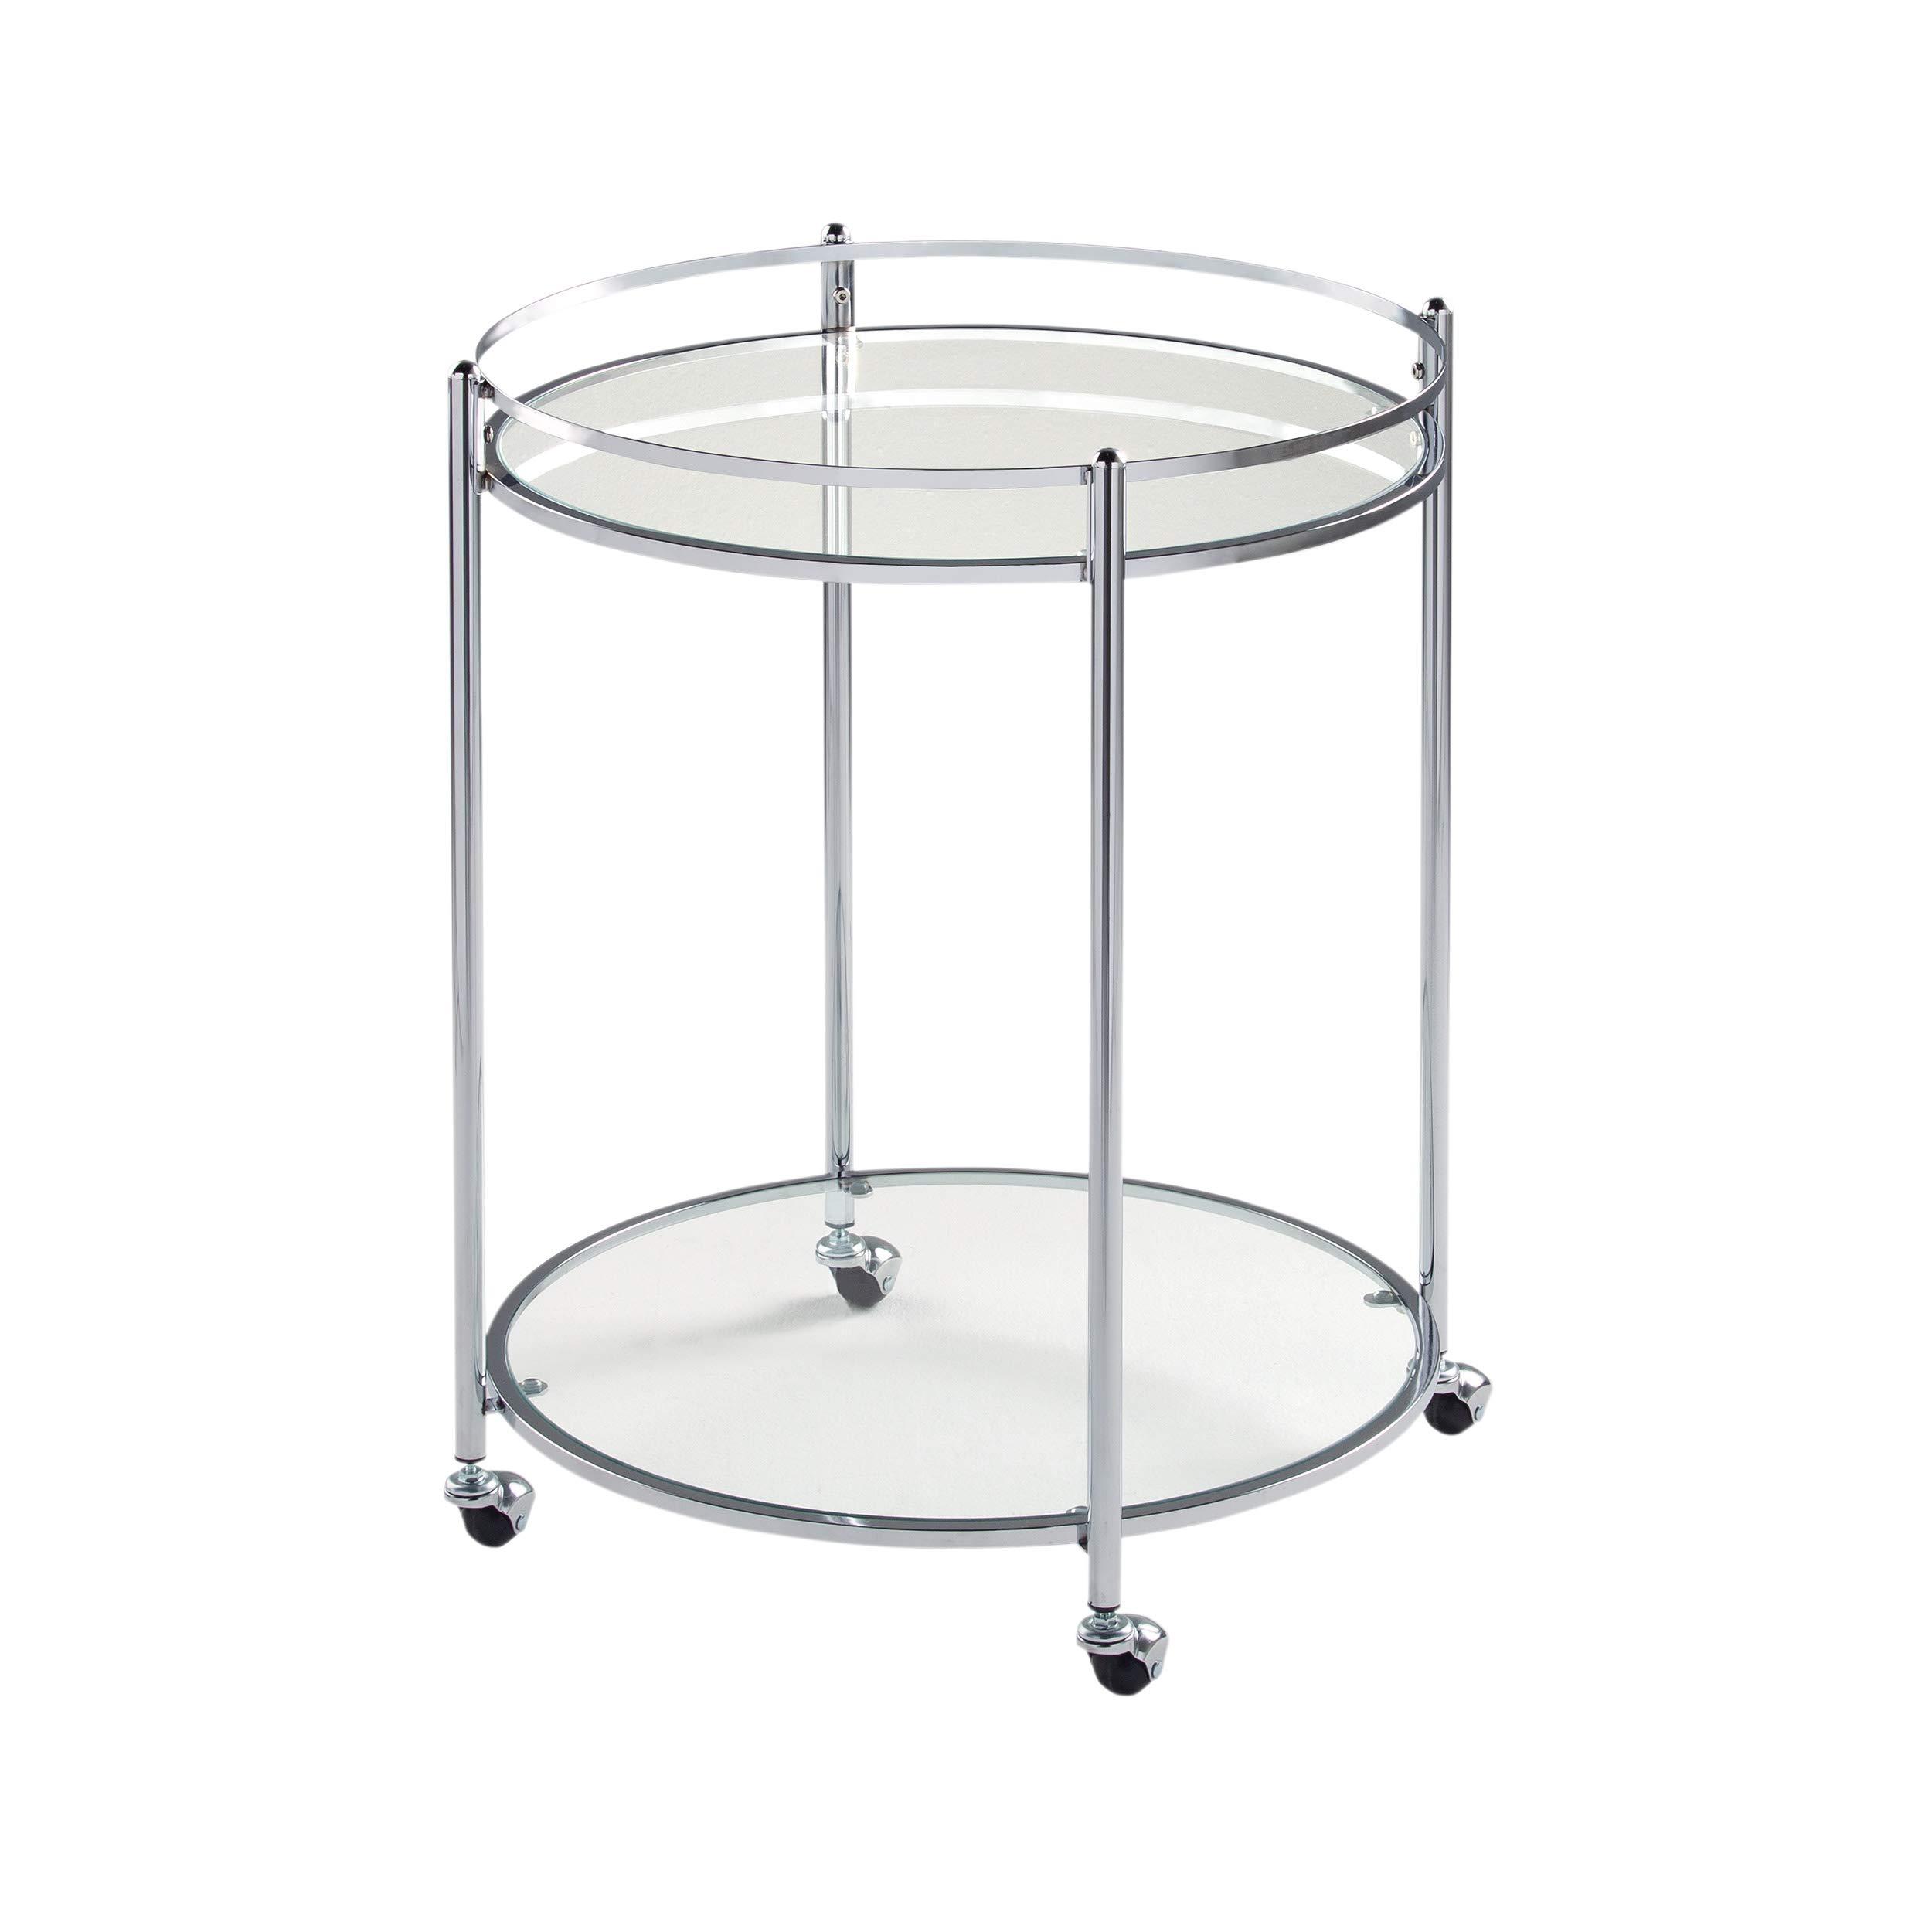 Studio Designs Home Veranda Bar Round Cart In Chrome with Clear Glass 71006 by Studio Designs Home